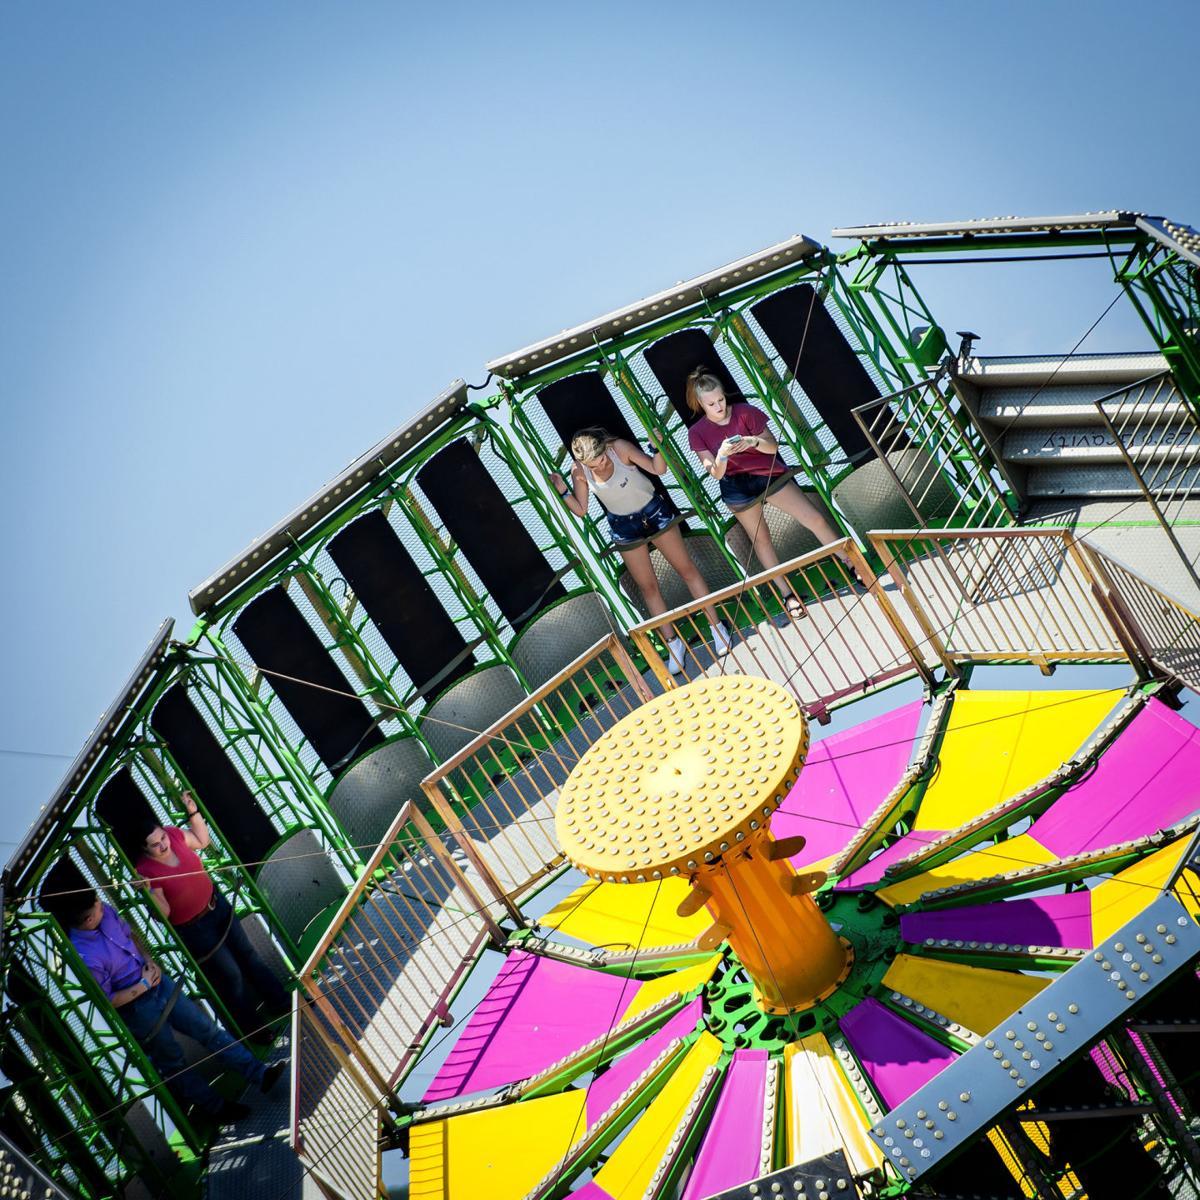 Gregg County Fair